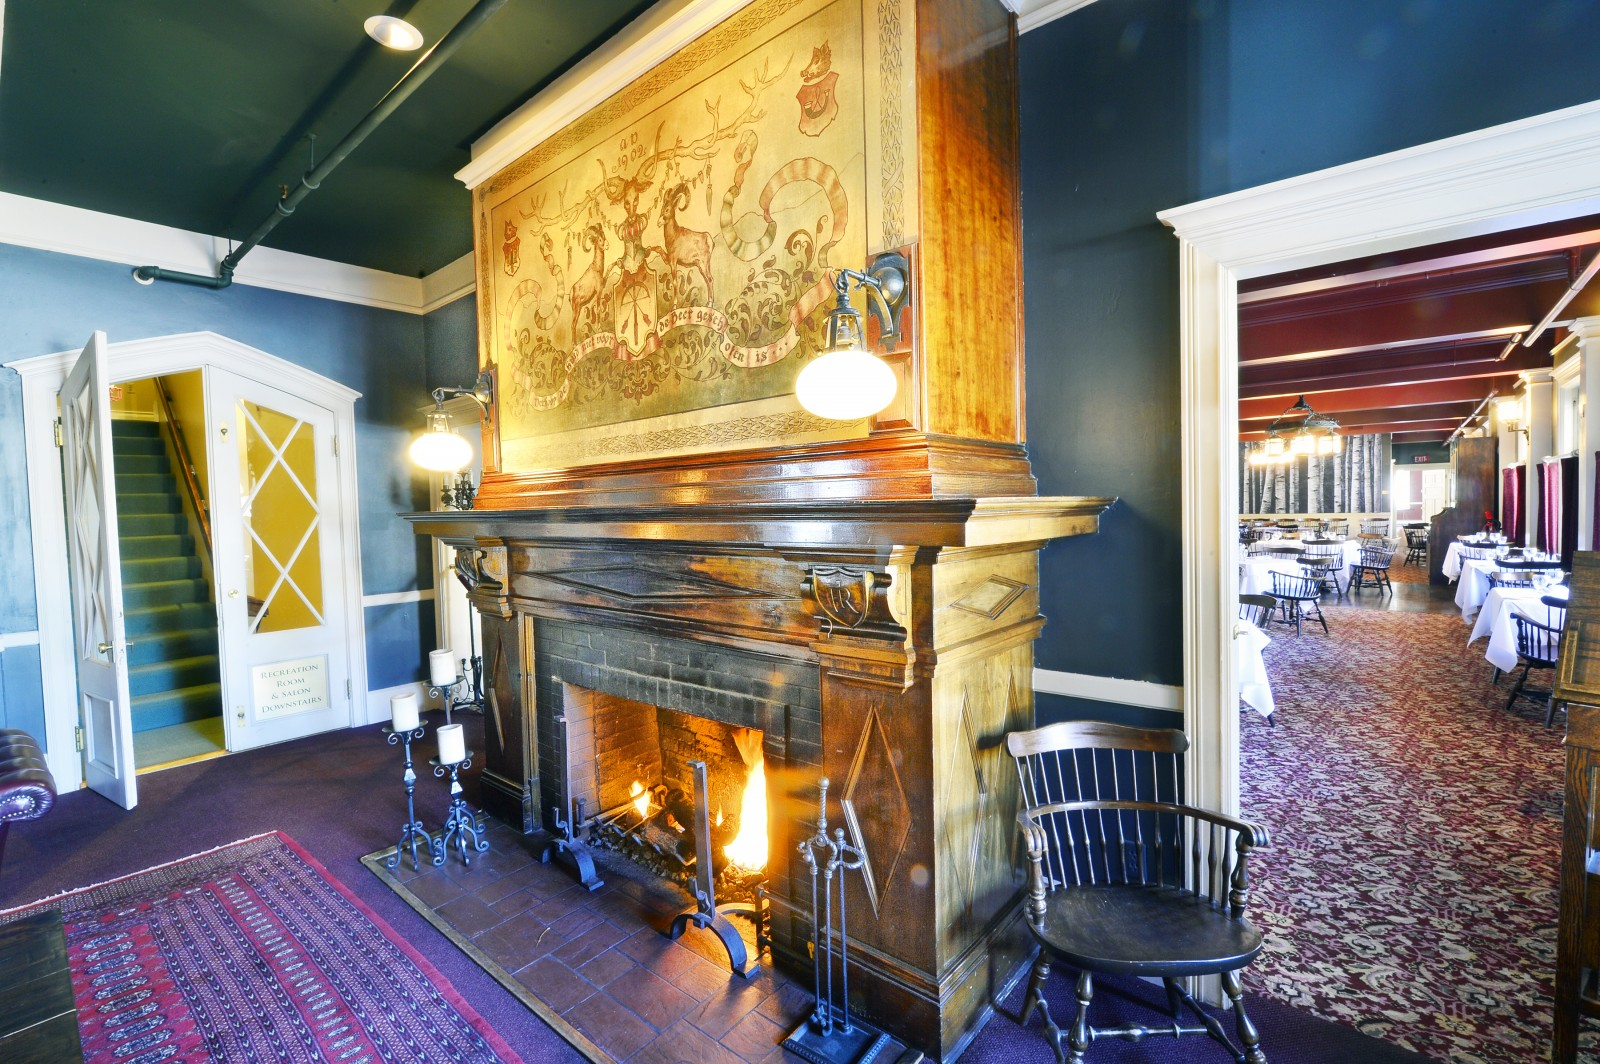 Vintage Fireplace at Redstone Inn